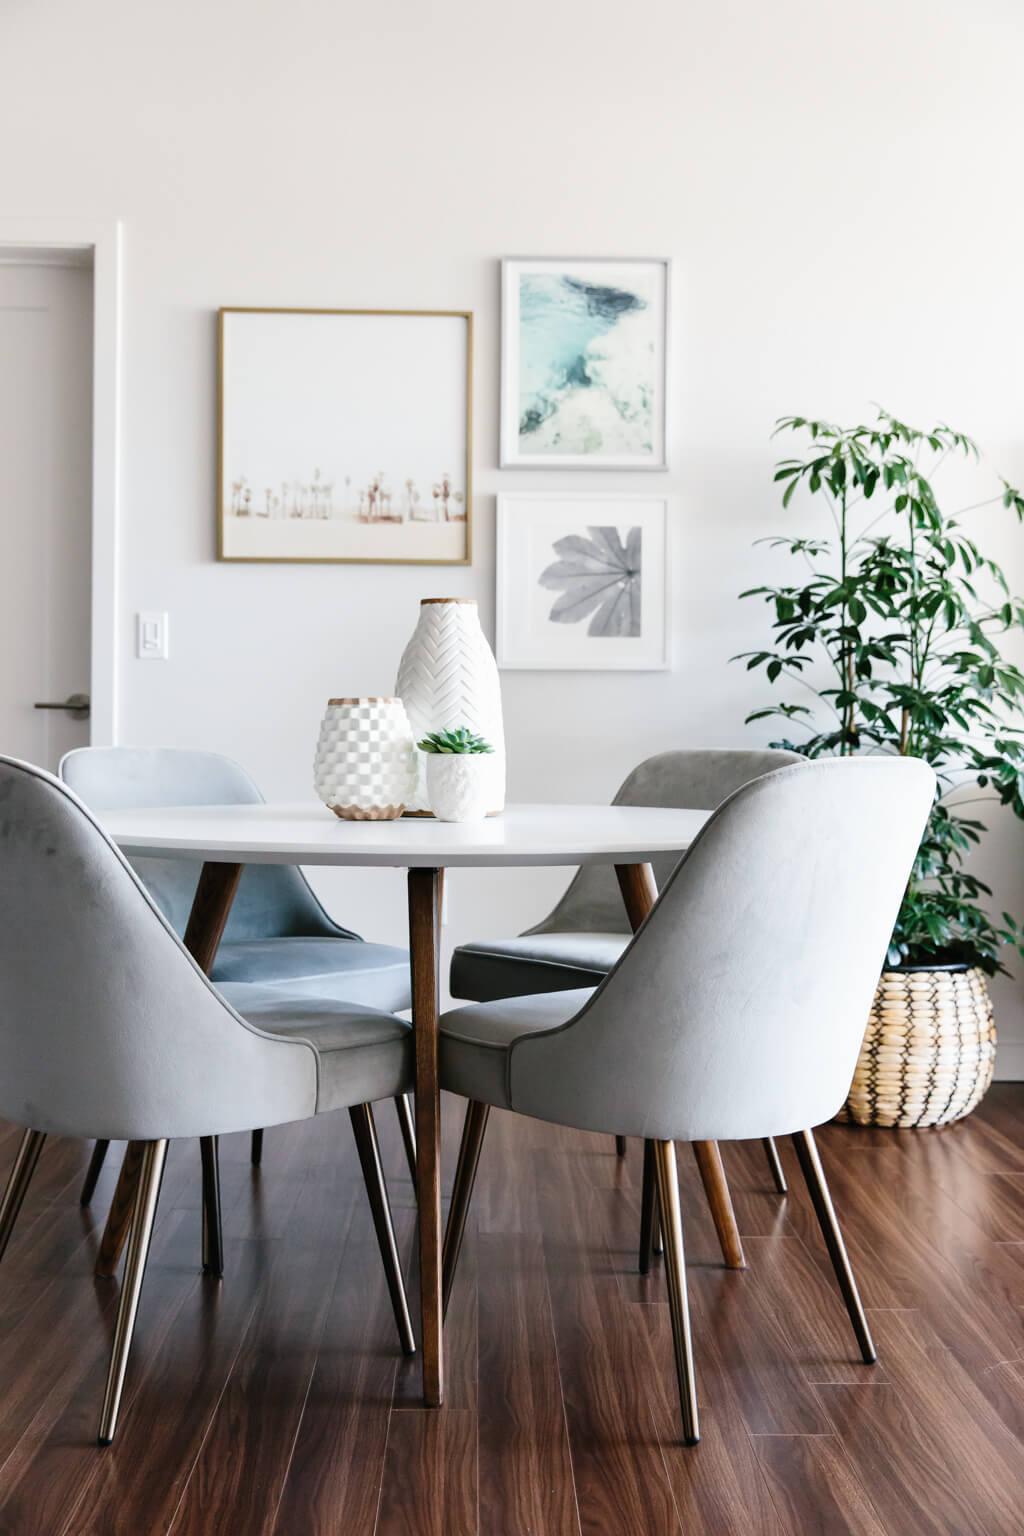 Designing my Modern and Minimalist Living Room with ... on Minimalist Living Room Design  id=92894